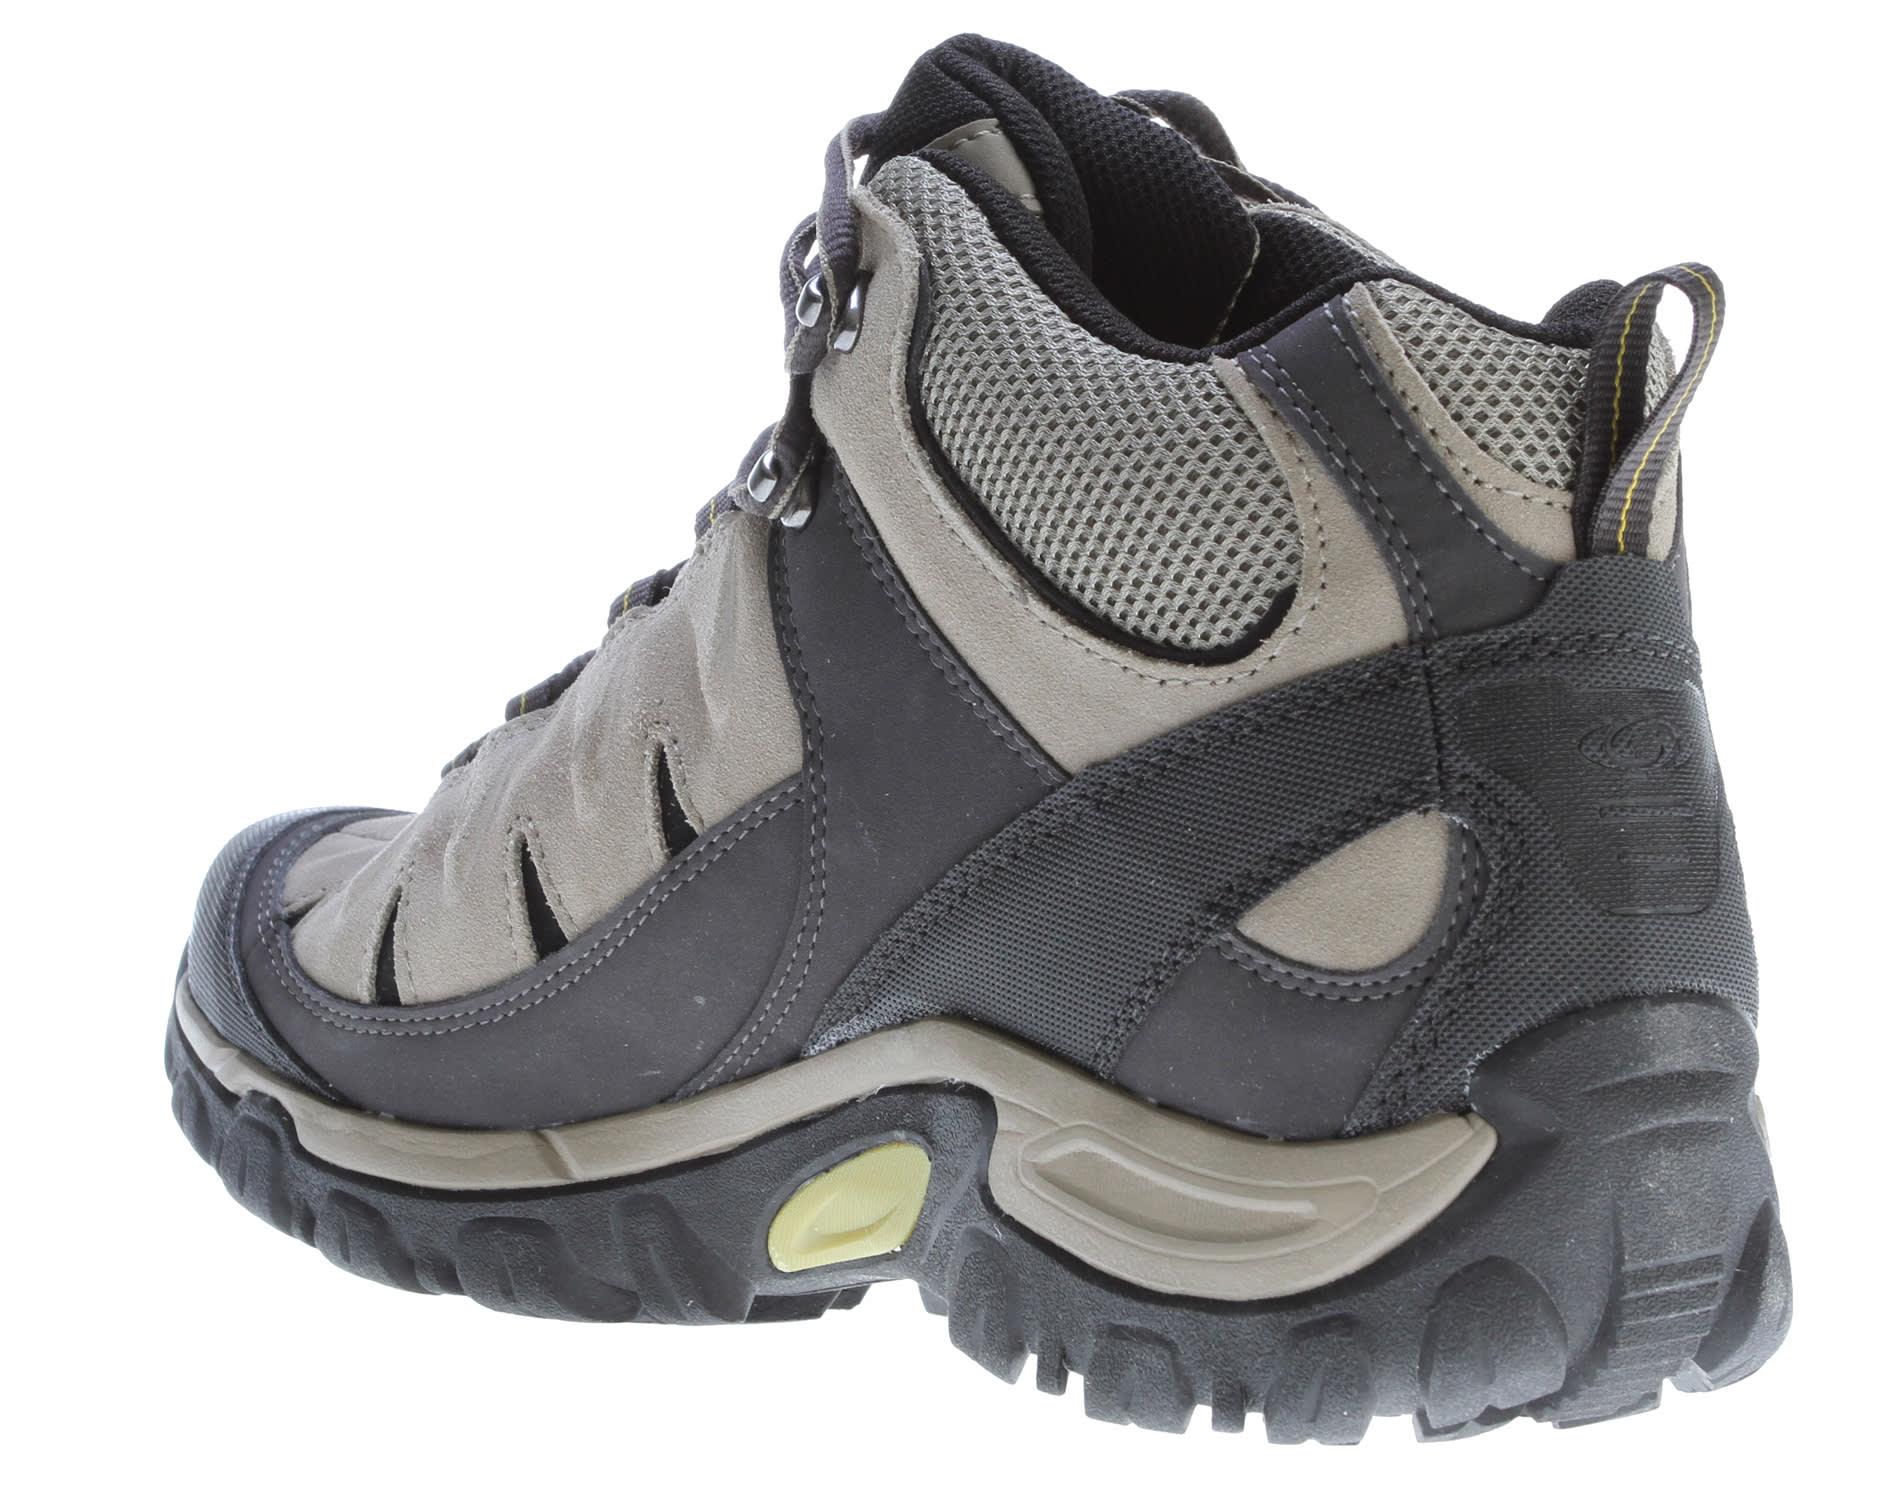 Chaussures Peak Fjtlkc31 Exit Gtx Ultra 2 Salomon X Yfyv67bg